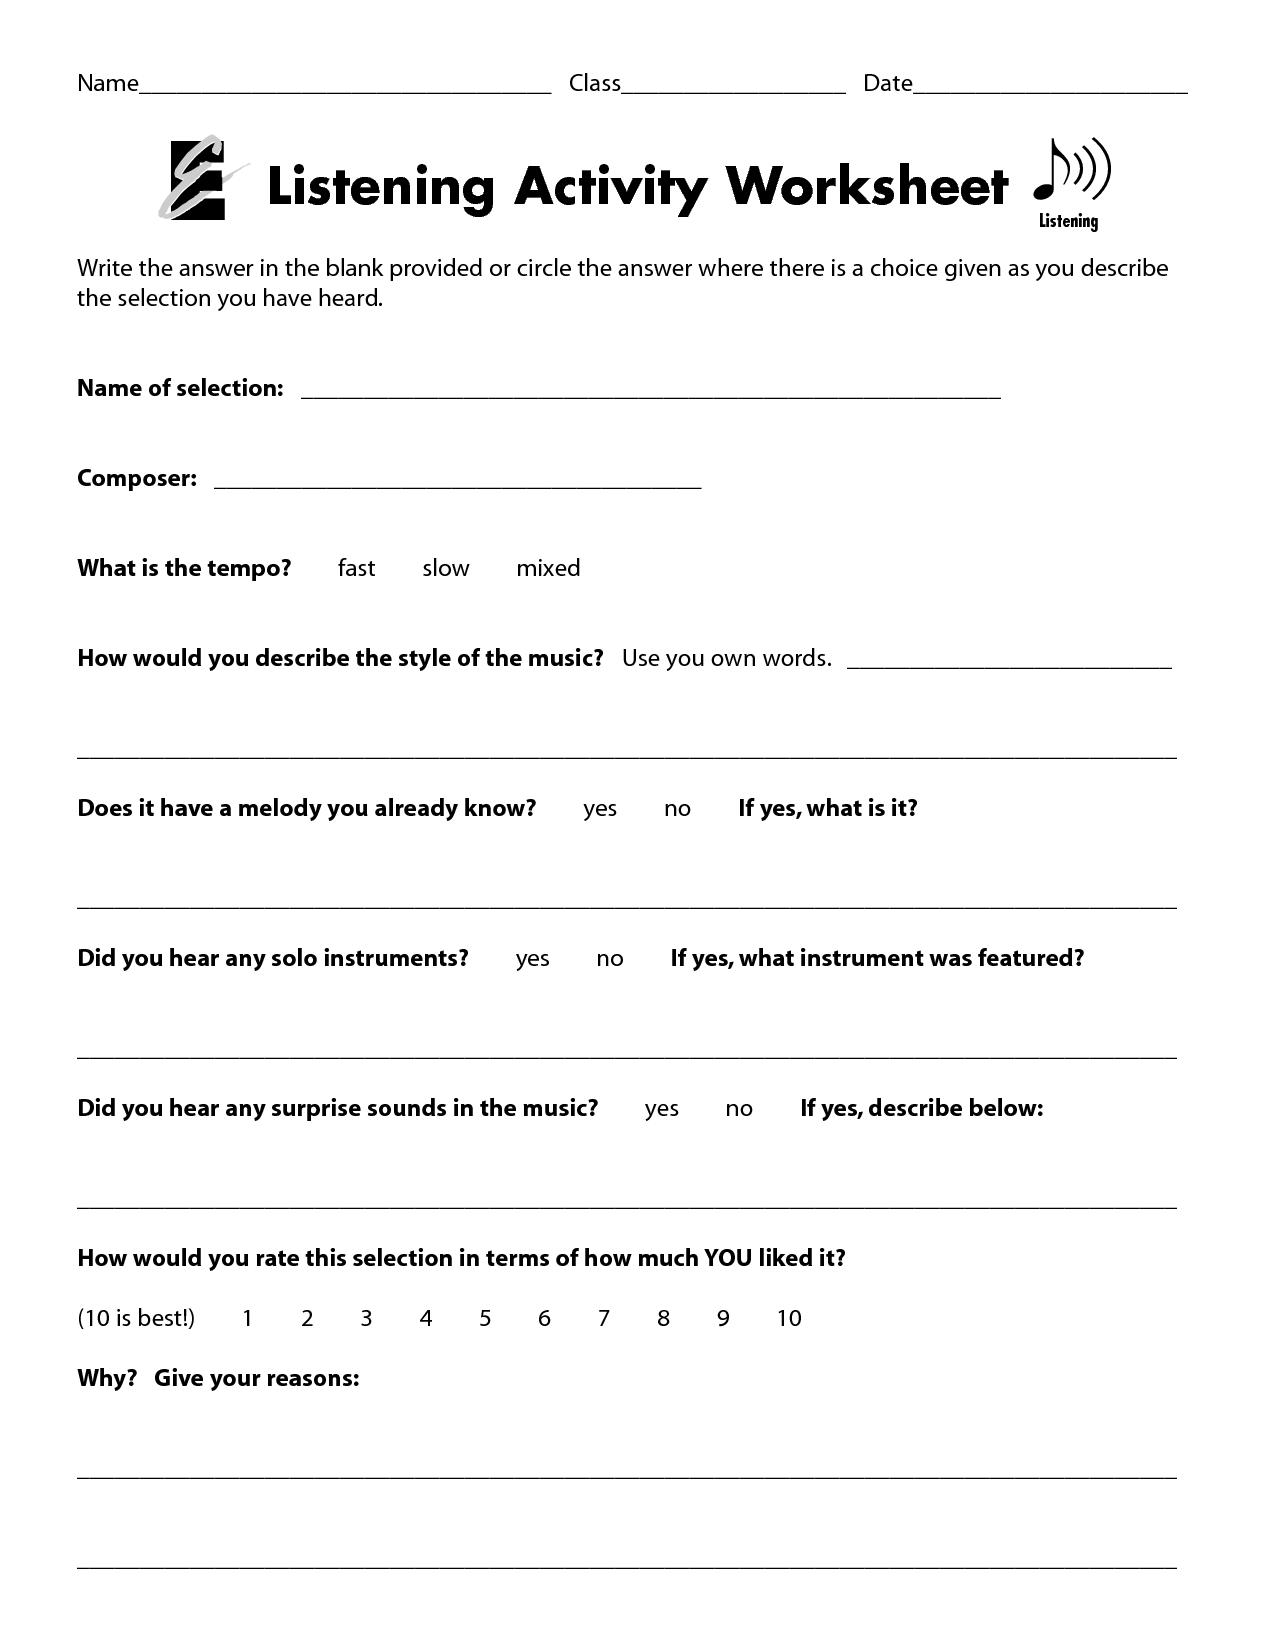 Listening Activity Worksheet